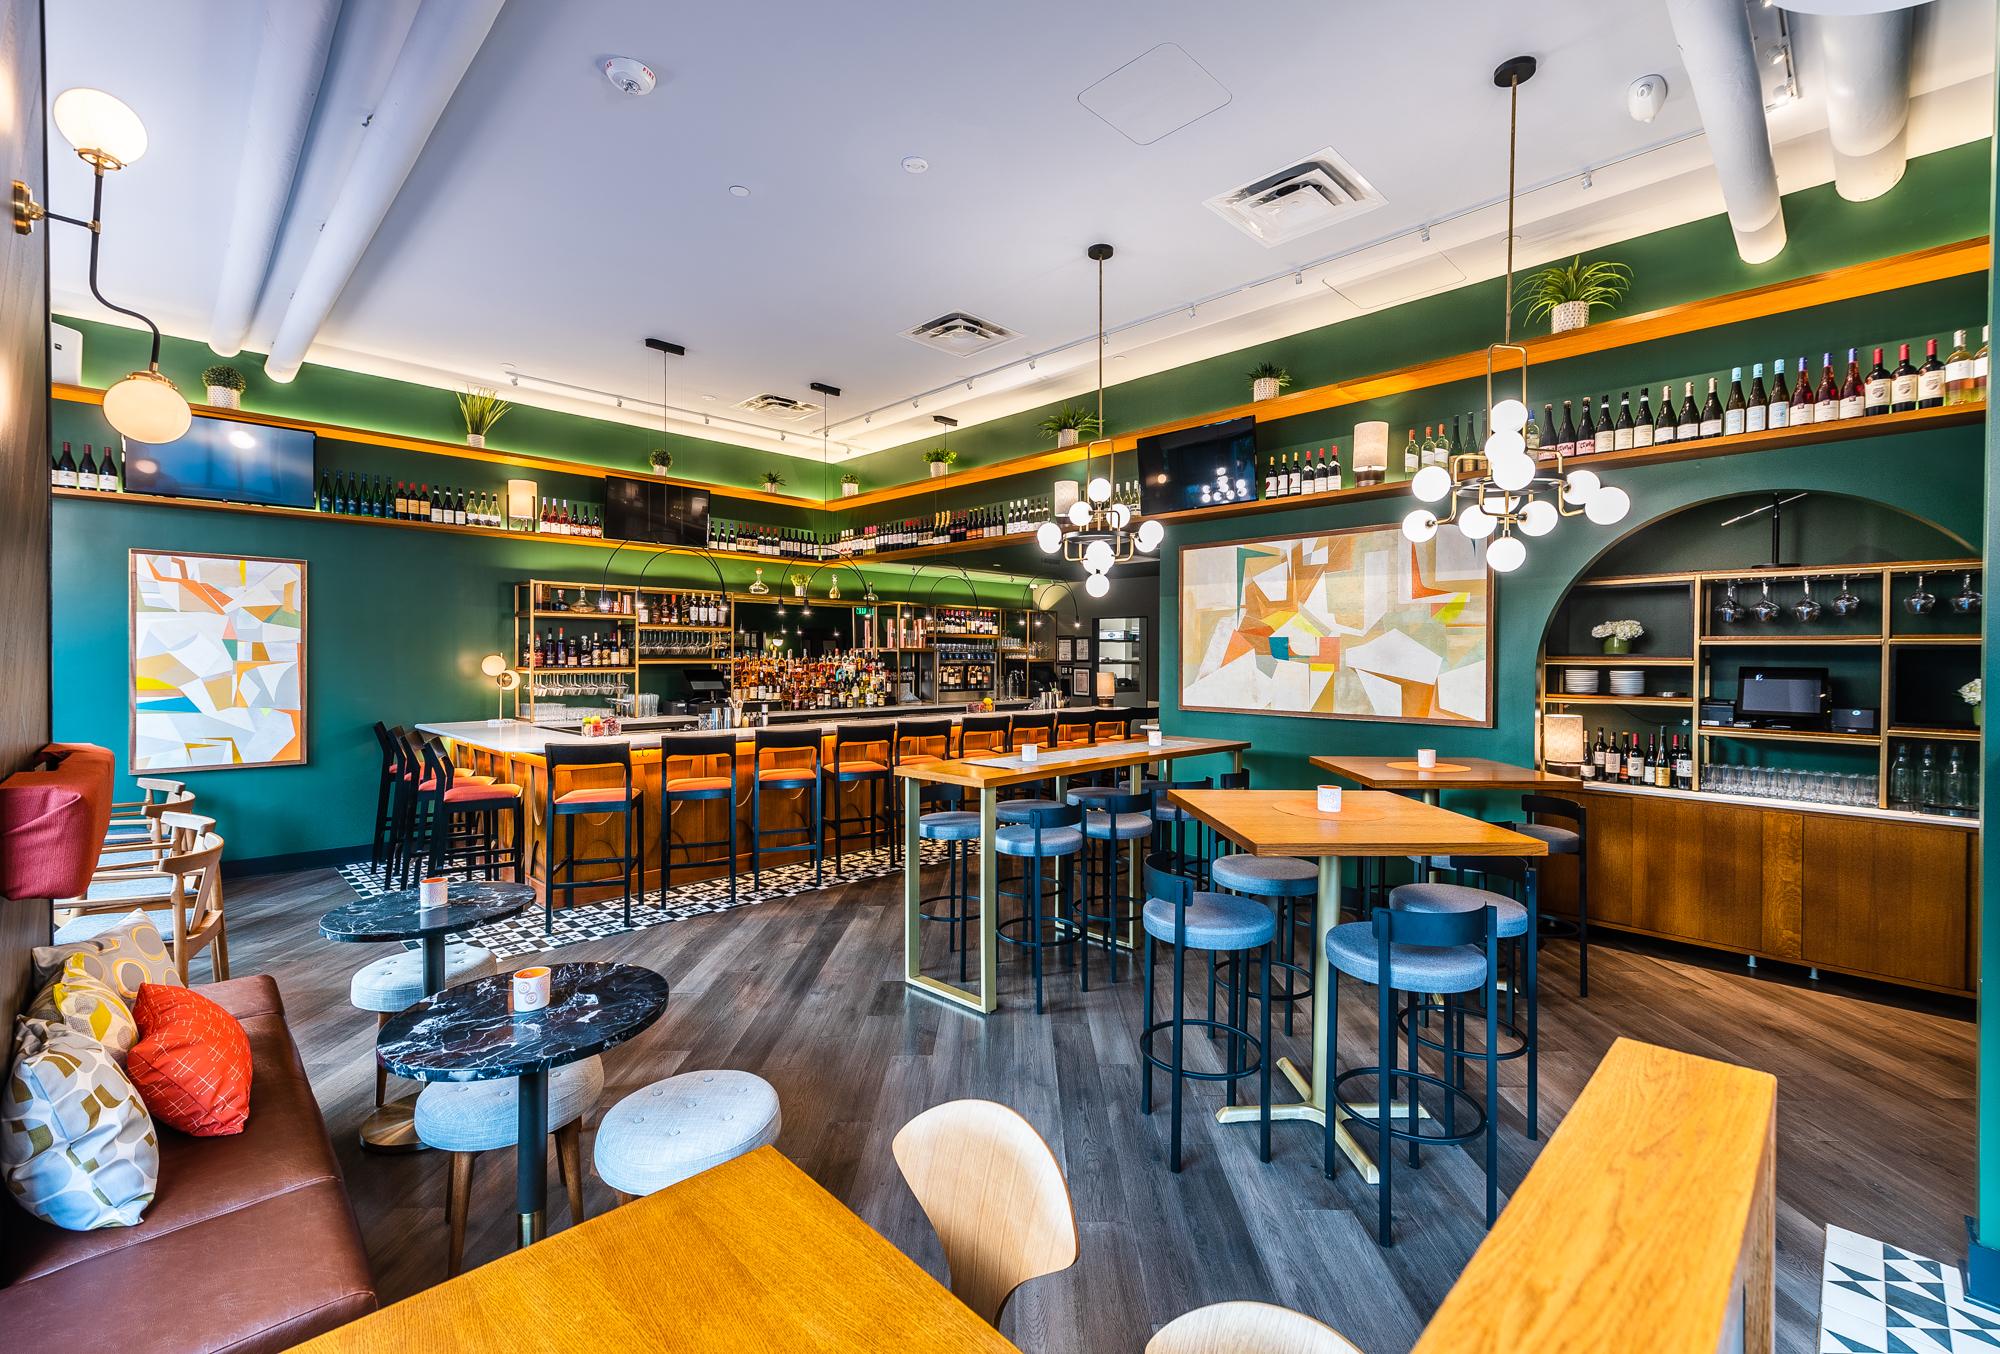 Capitol Hill's Dazzling New Wine Bar Looks Like a Retro Study